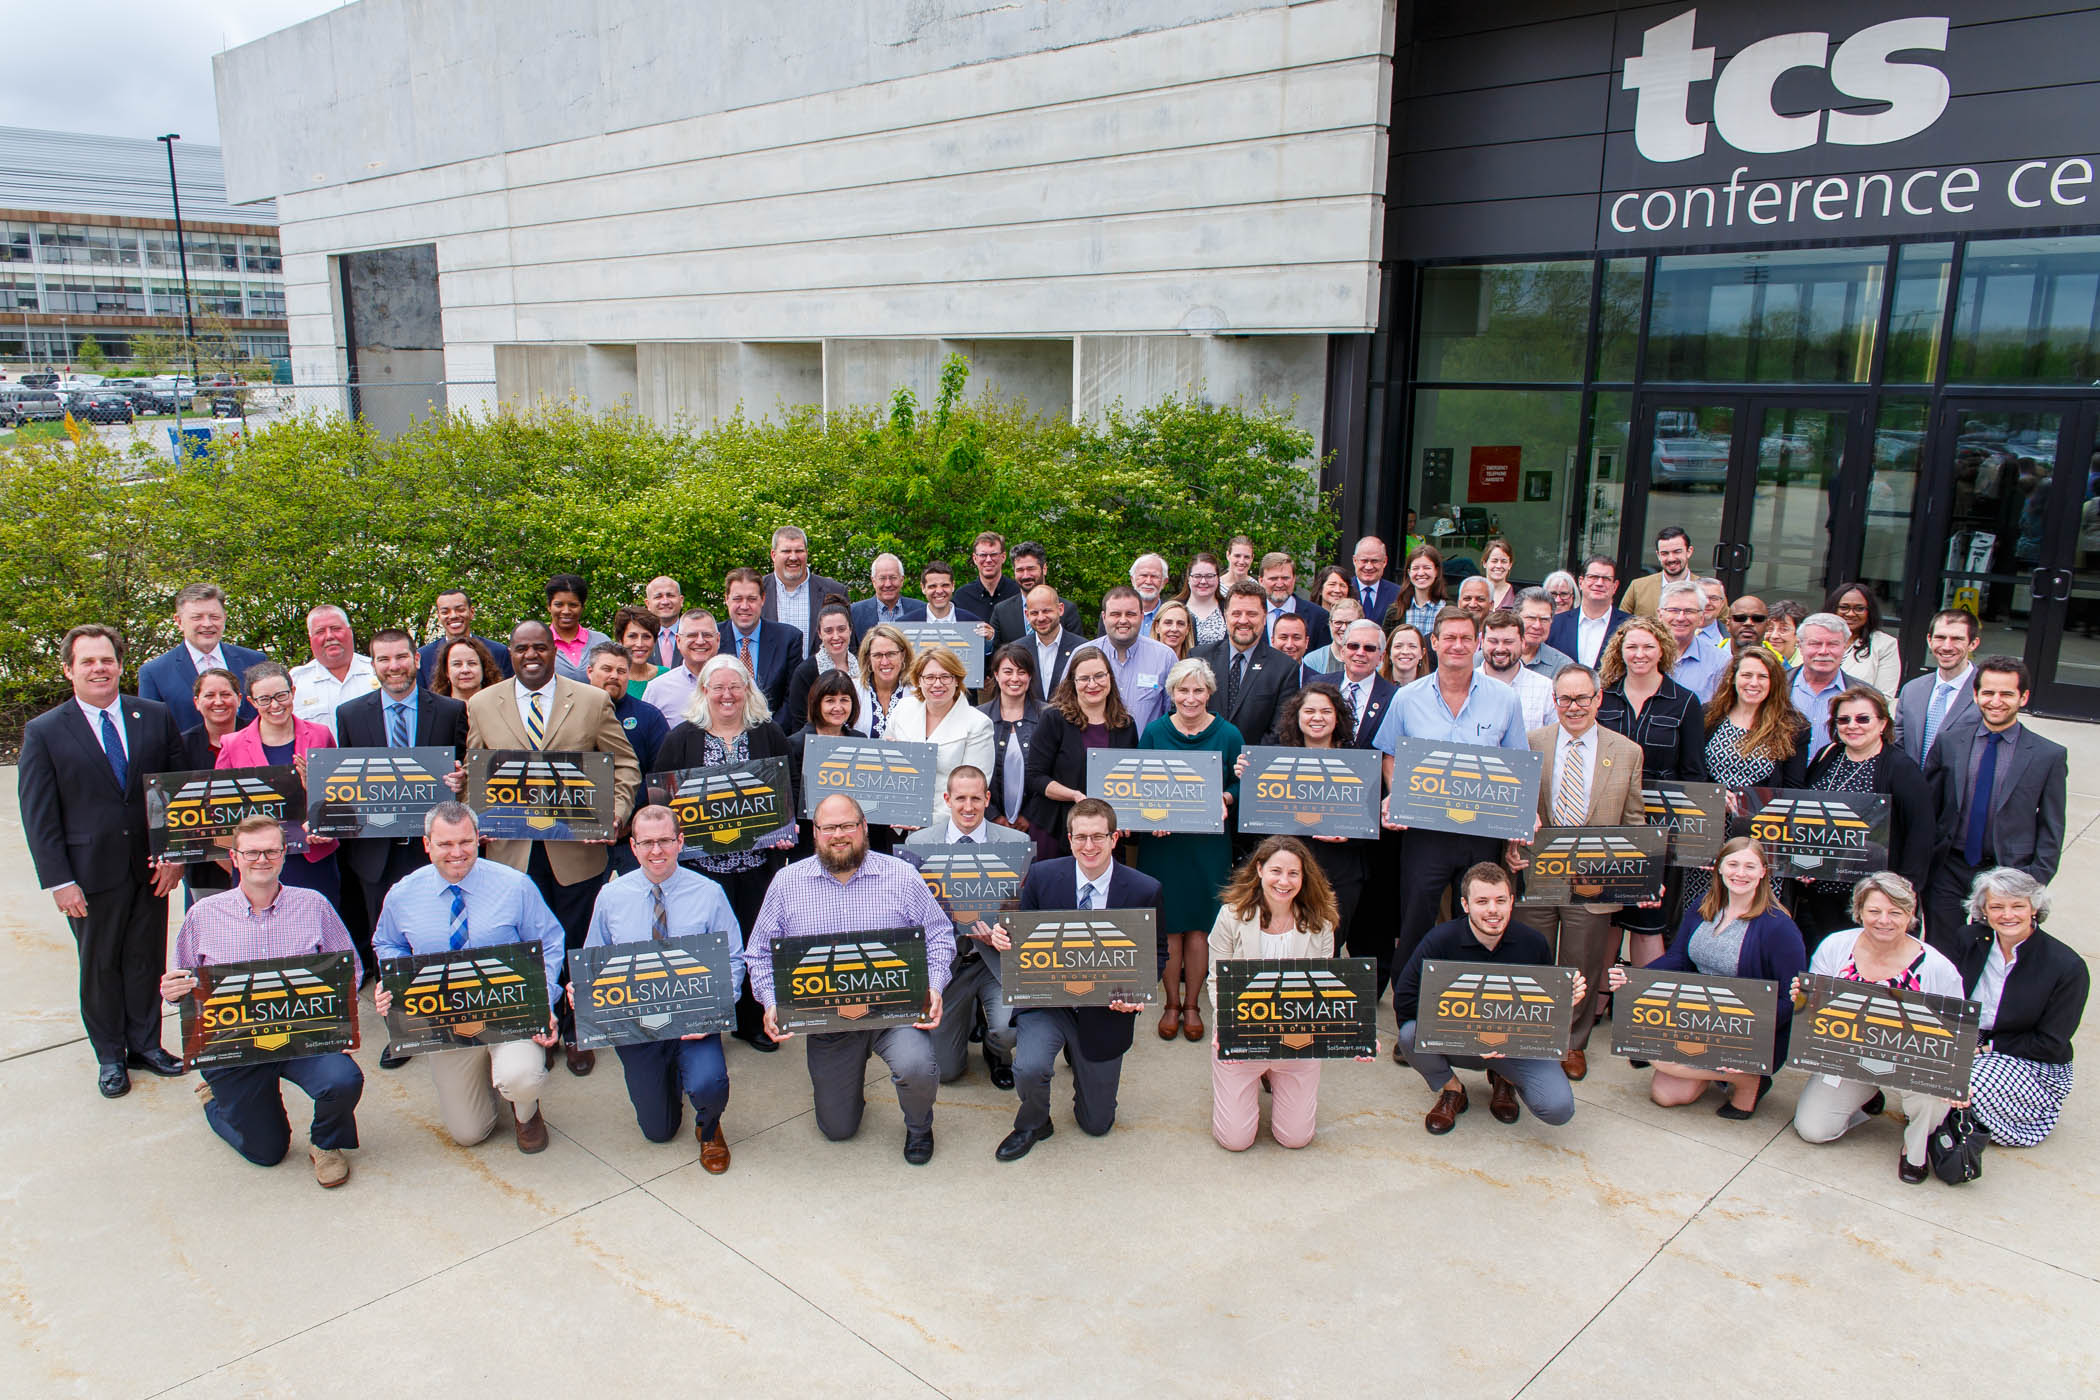 New Department of Energy Challenge: 60 More SolSmart Designees in 6 Months!